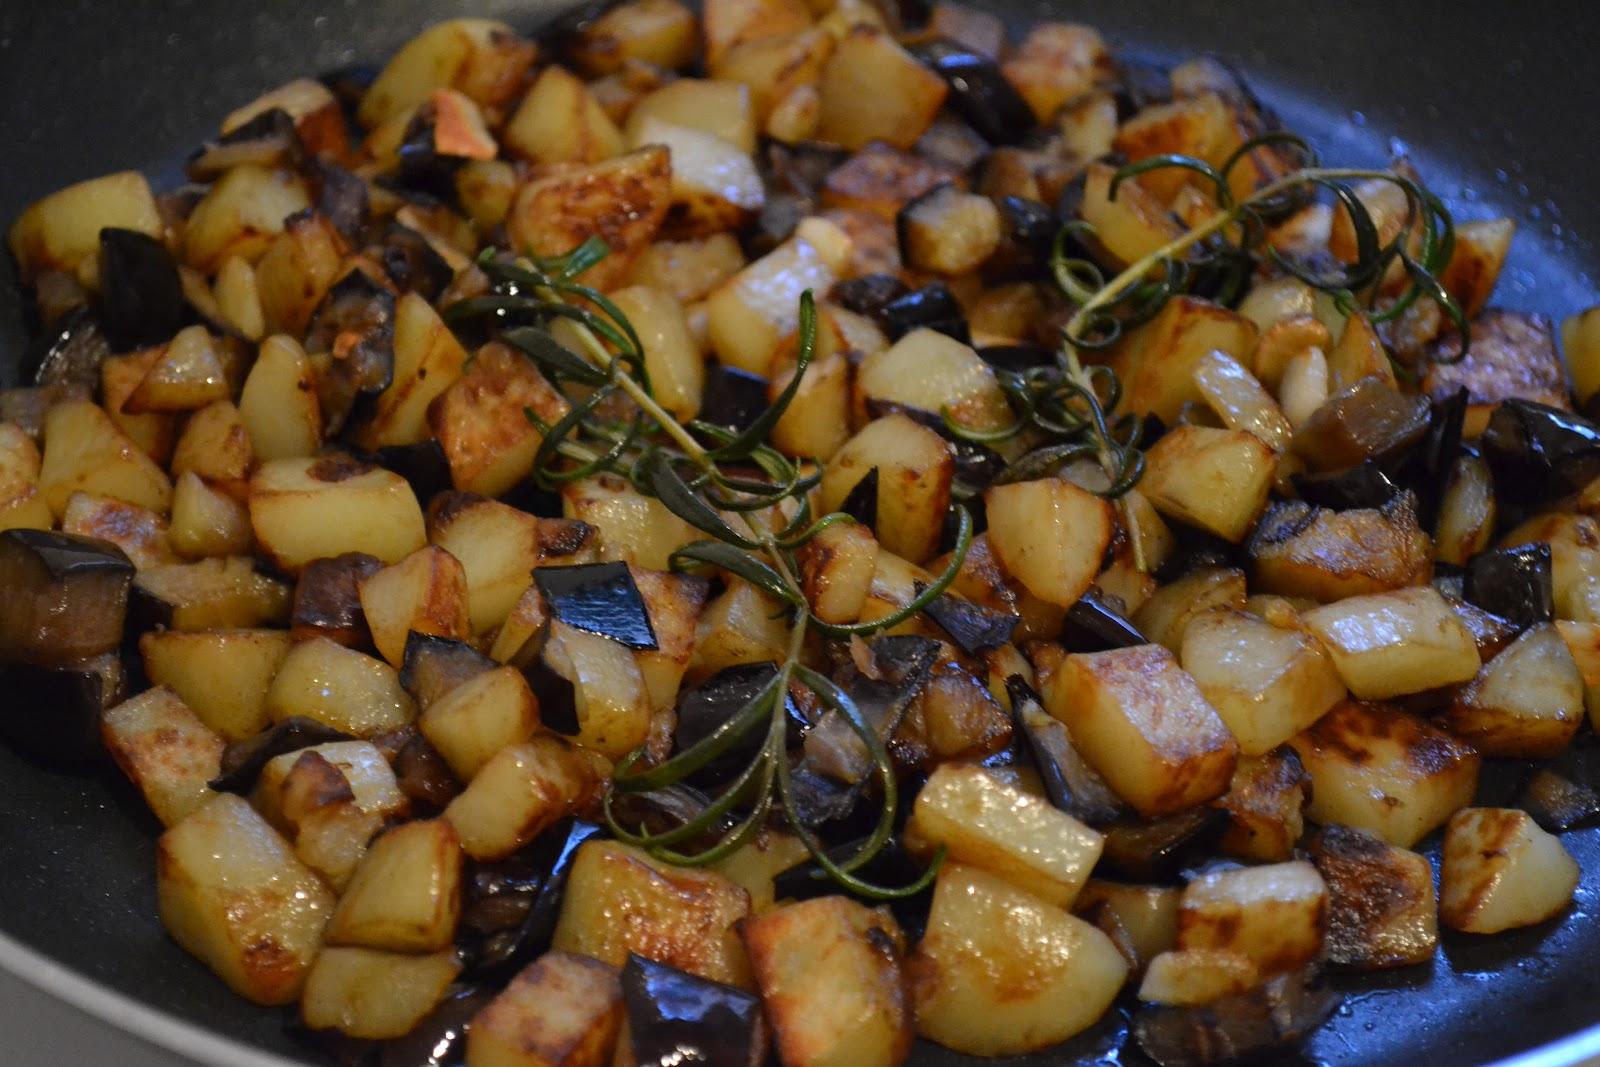 lili u0026 39 s cookbook  pommes de terre et aubergines po u00eal u00e9es